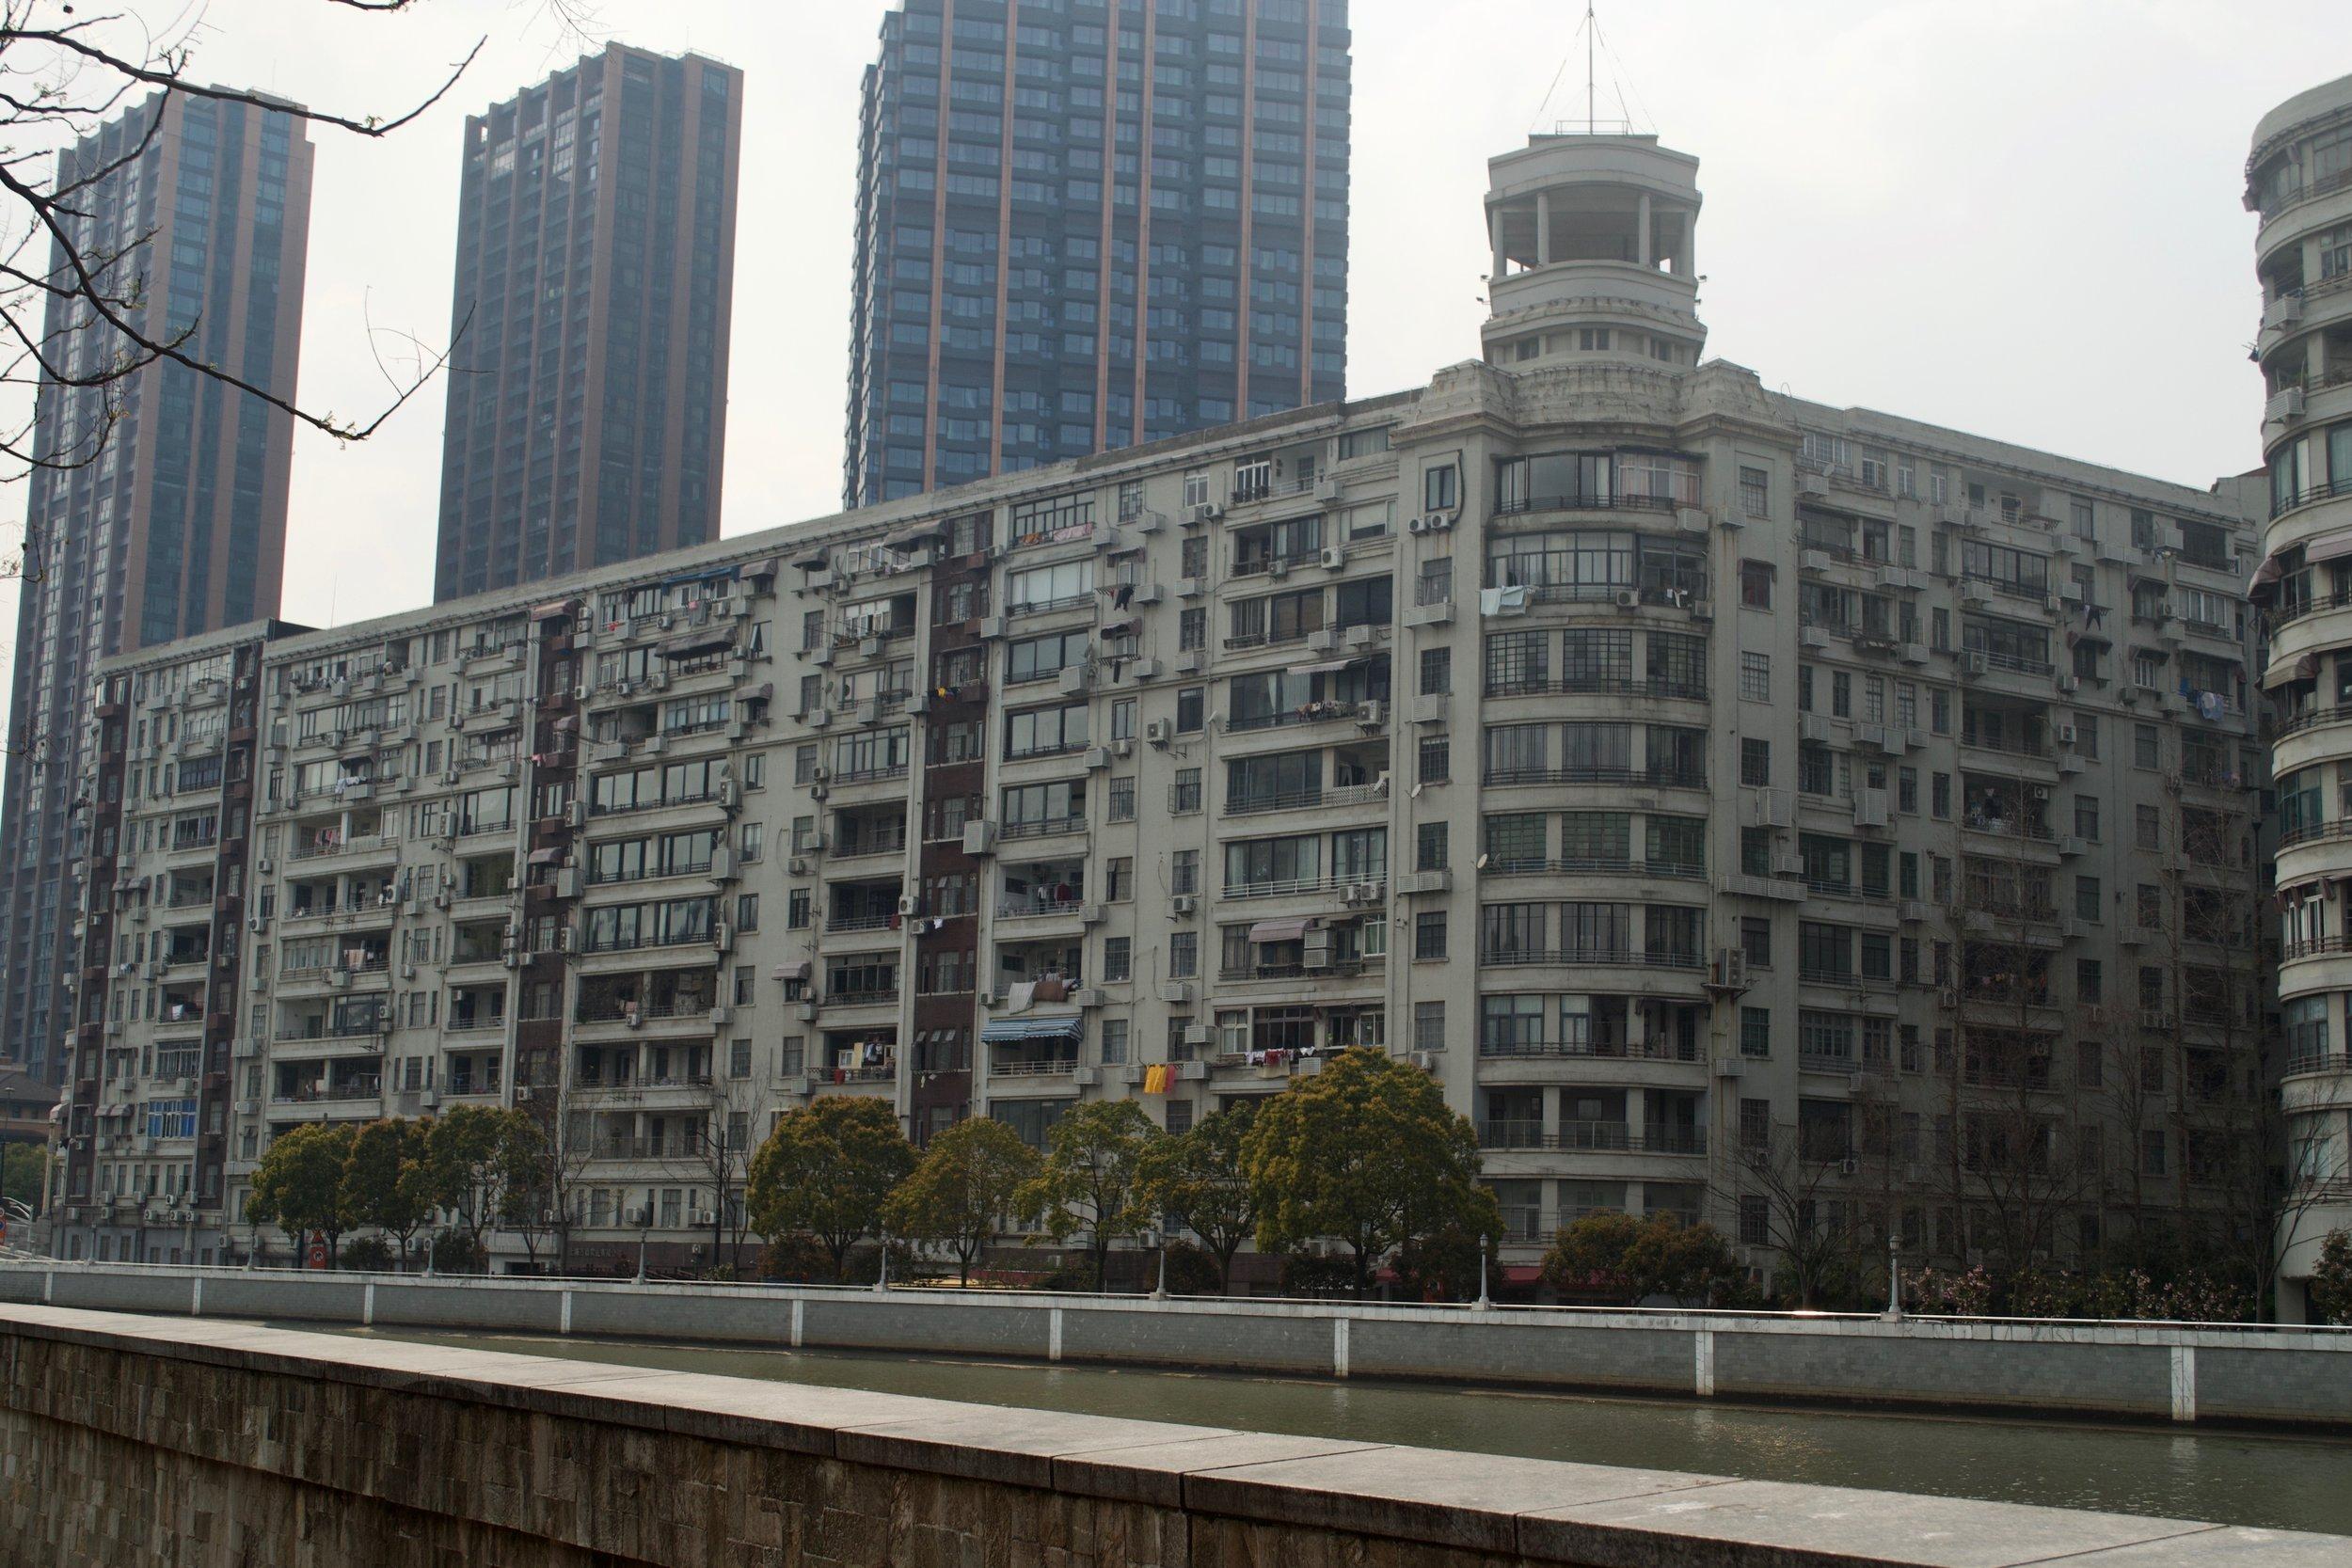 Embarkment House (河滨大楼) [Nicholas Zhang Archives]